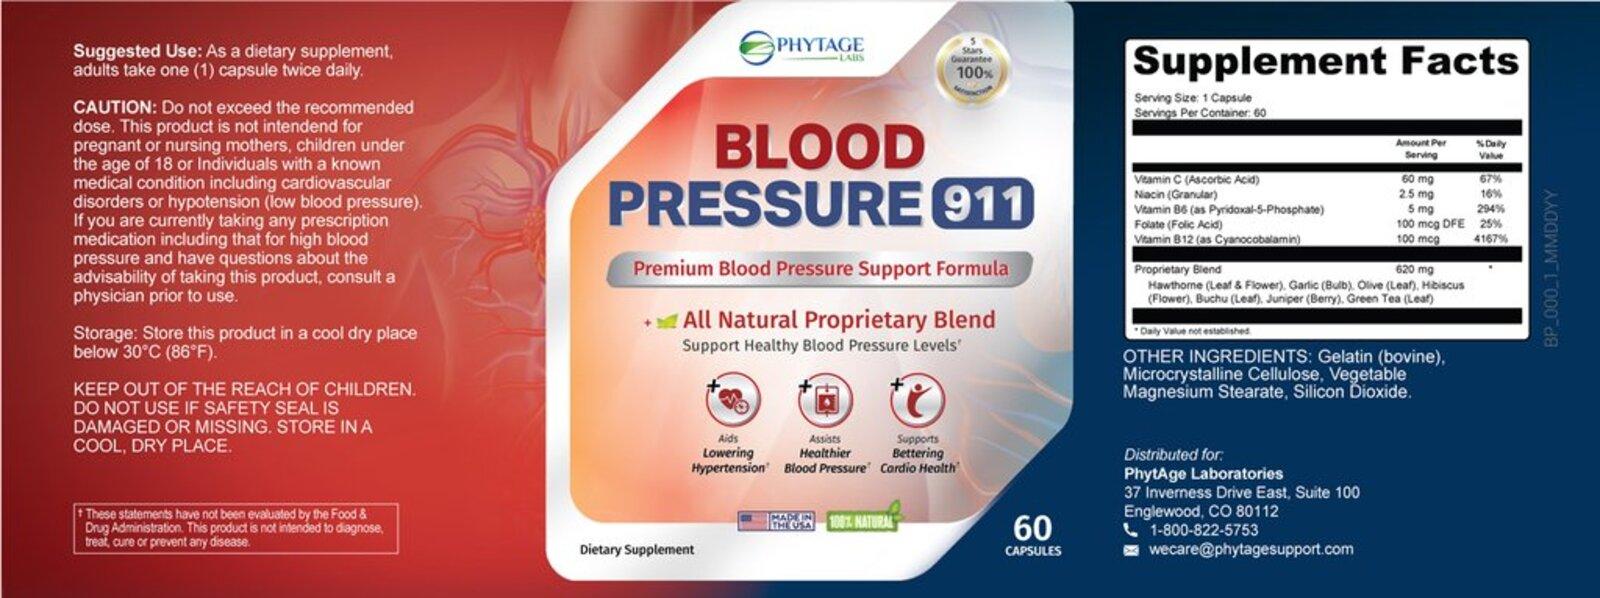 Blood Pressure 911 Reviews – Does PhytAge Blood Pressure 911 Work? MJ Customer Reviews Explains